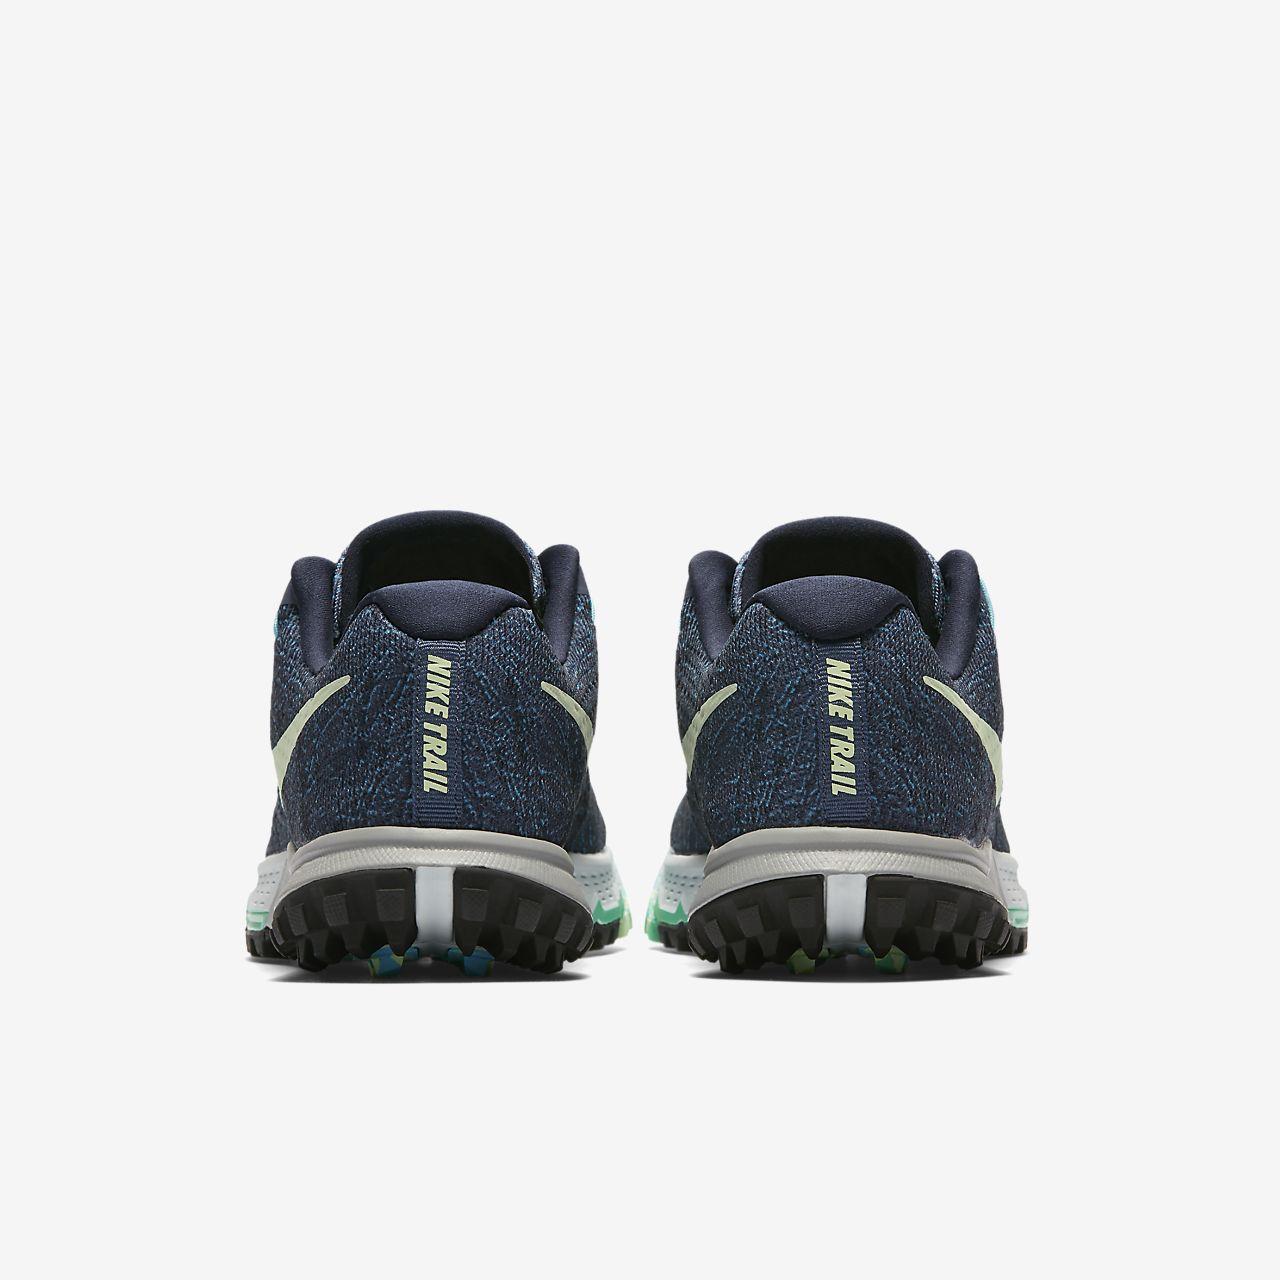 5c5f2e95 Nike Air Zoom Terra Kiger 4 Women's Running Shoe. Nike.com SK